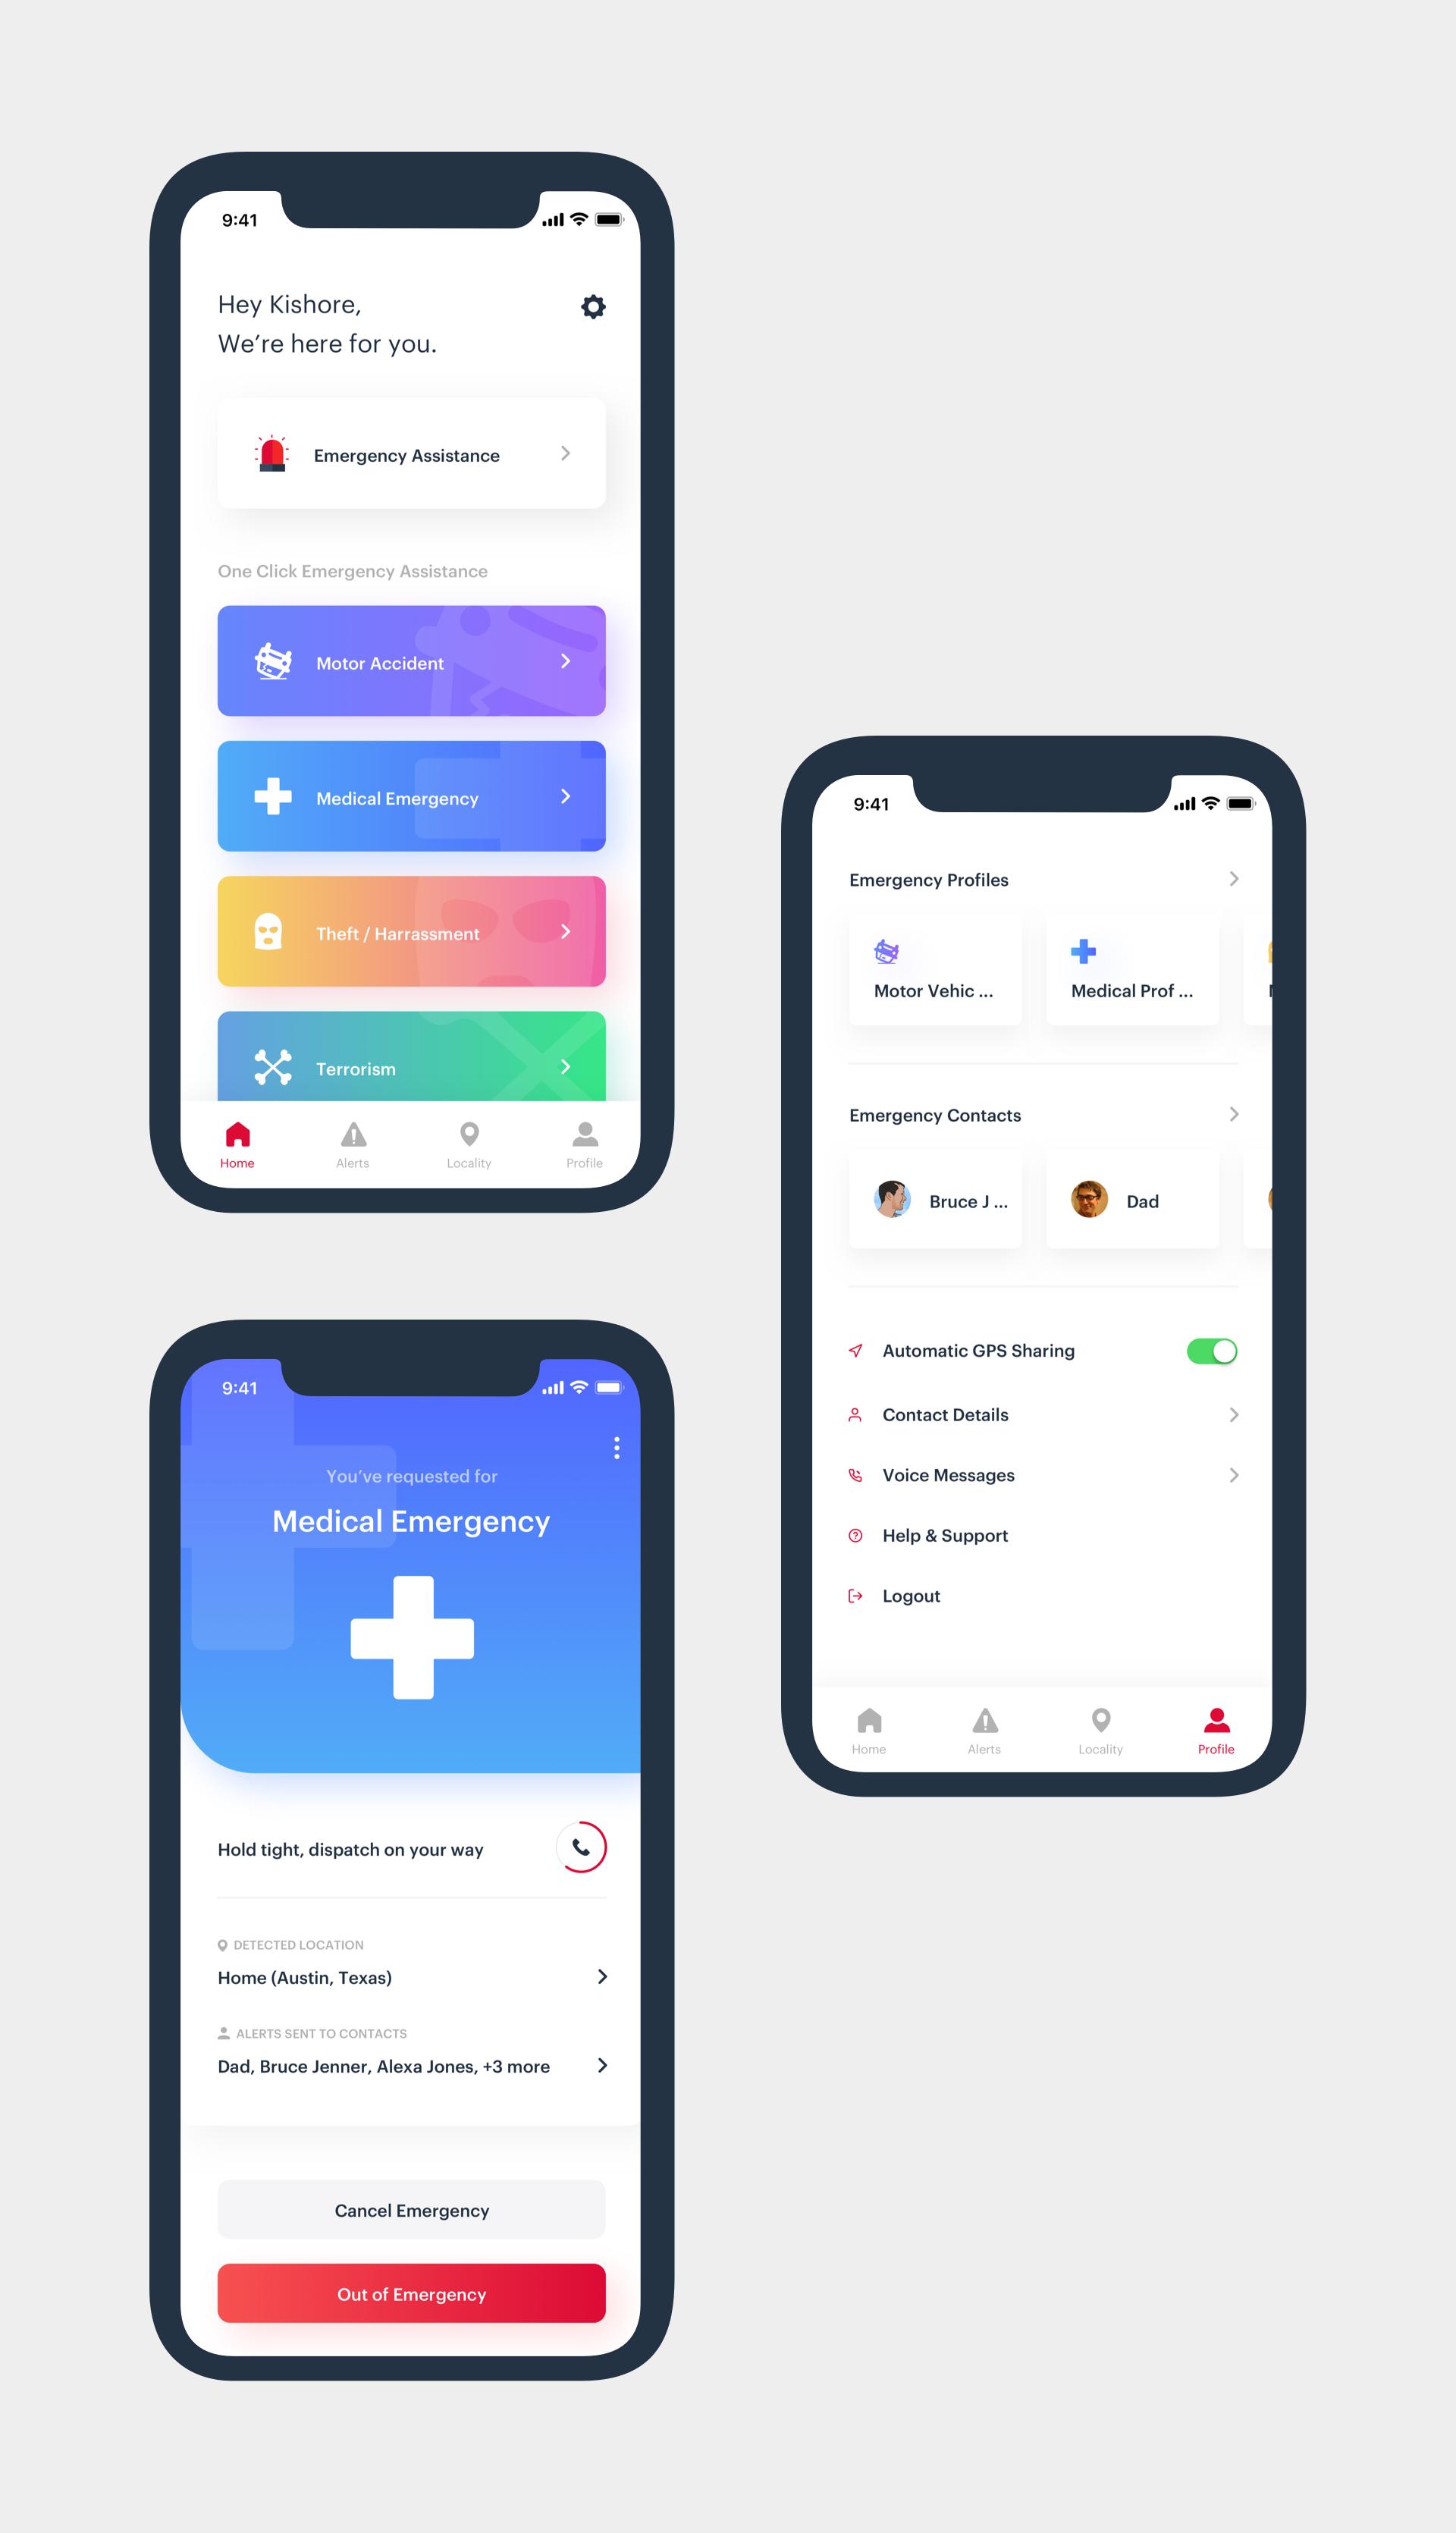 Day 203 Emergency Crisis Response App Concept